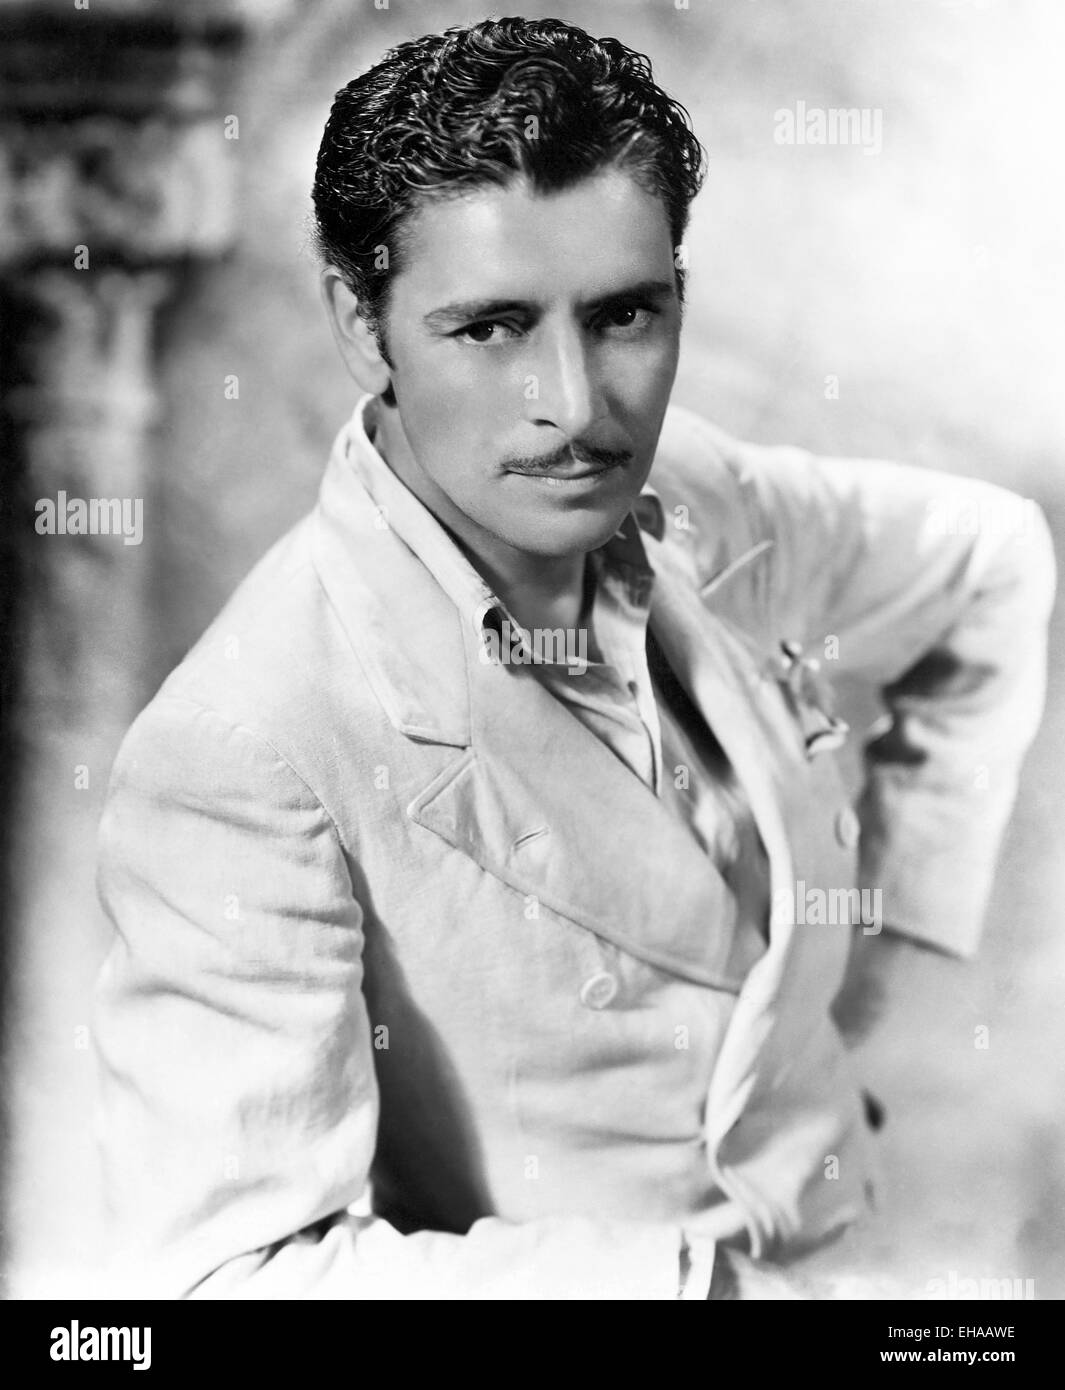 Ronald Colman, on-set of the Film 'The Unholy Garden', 1931 - Stock Image